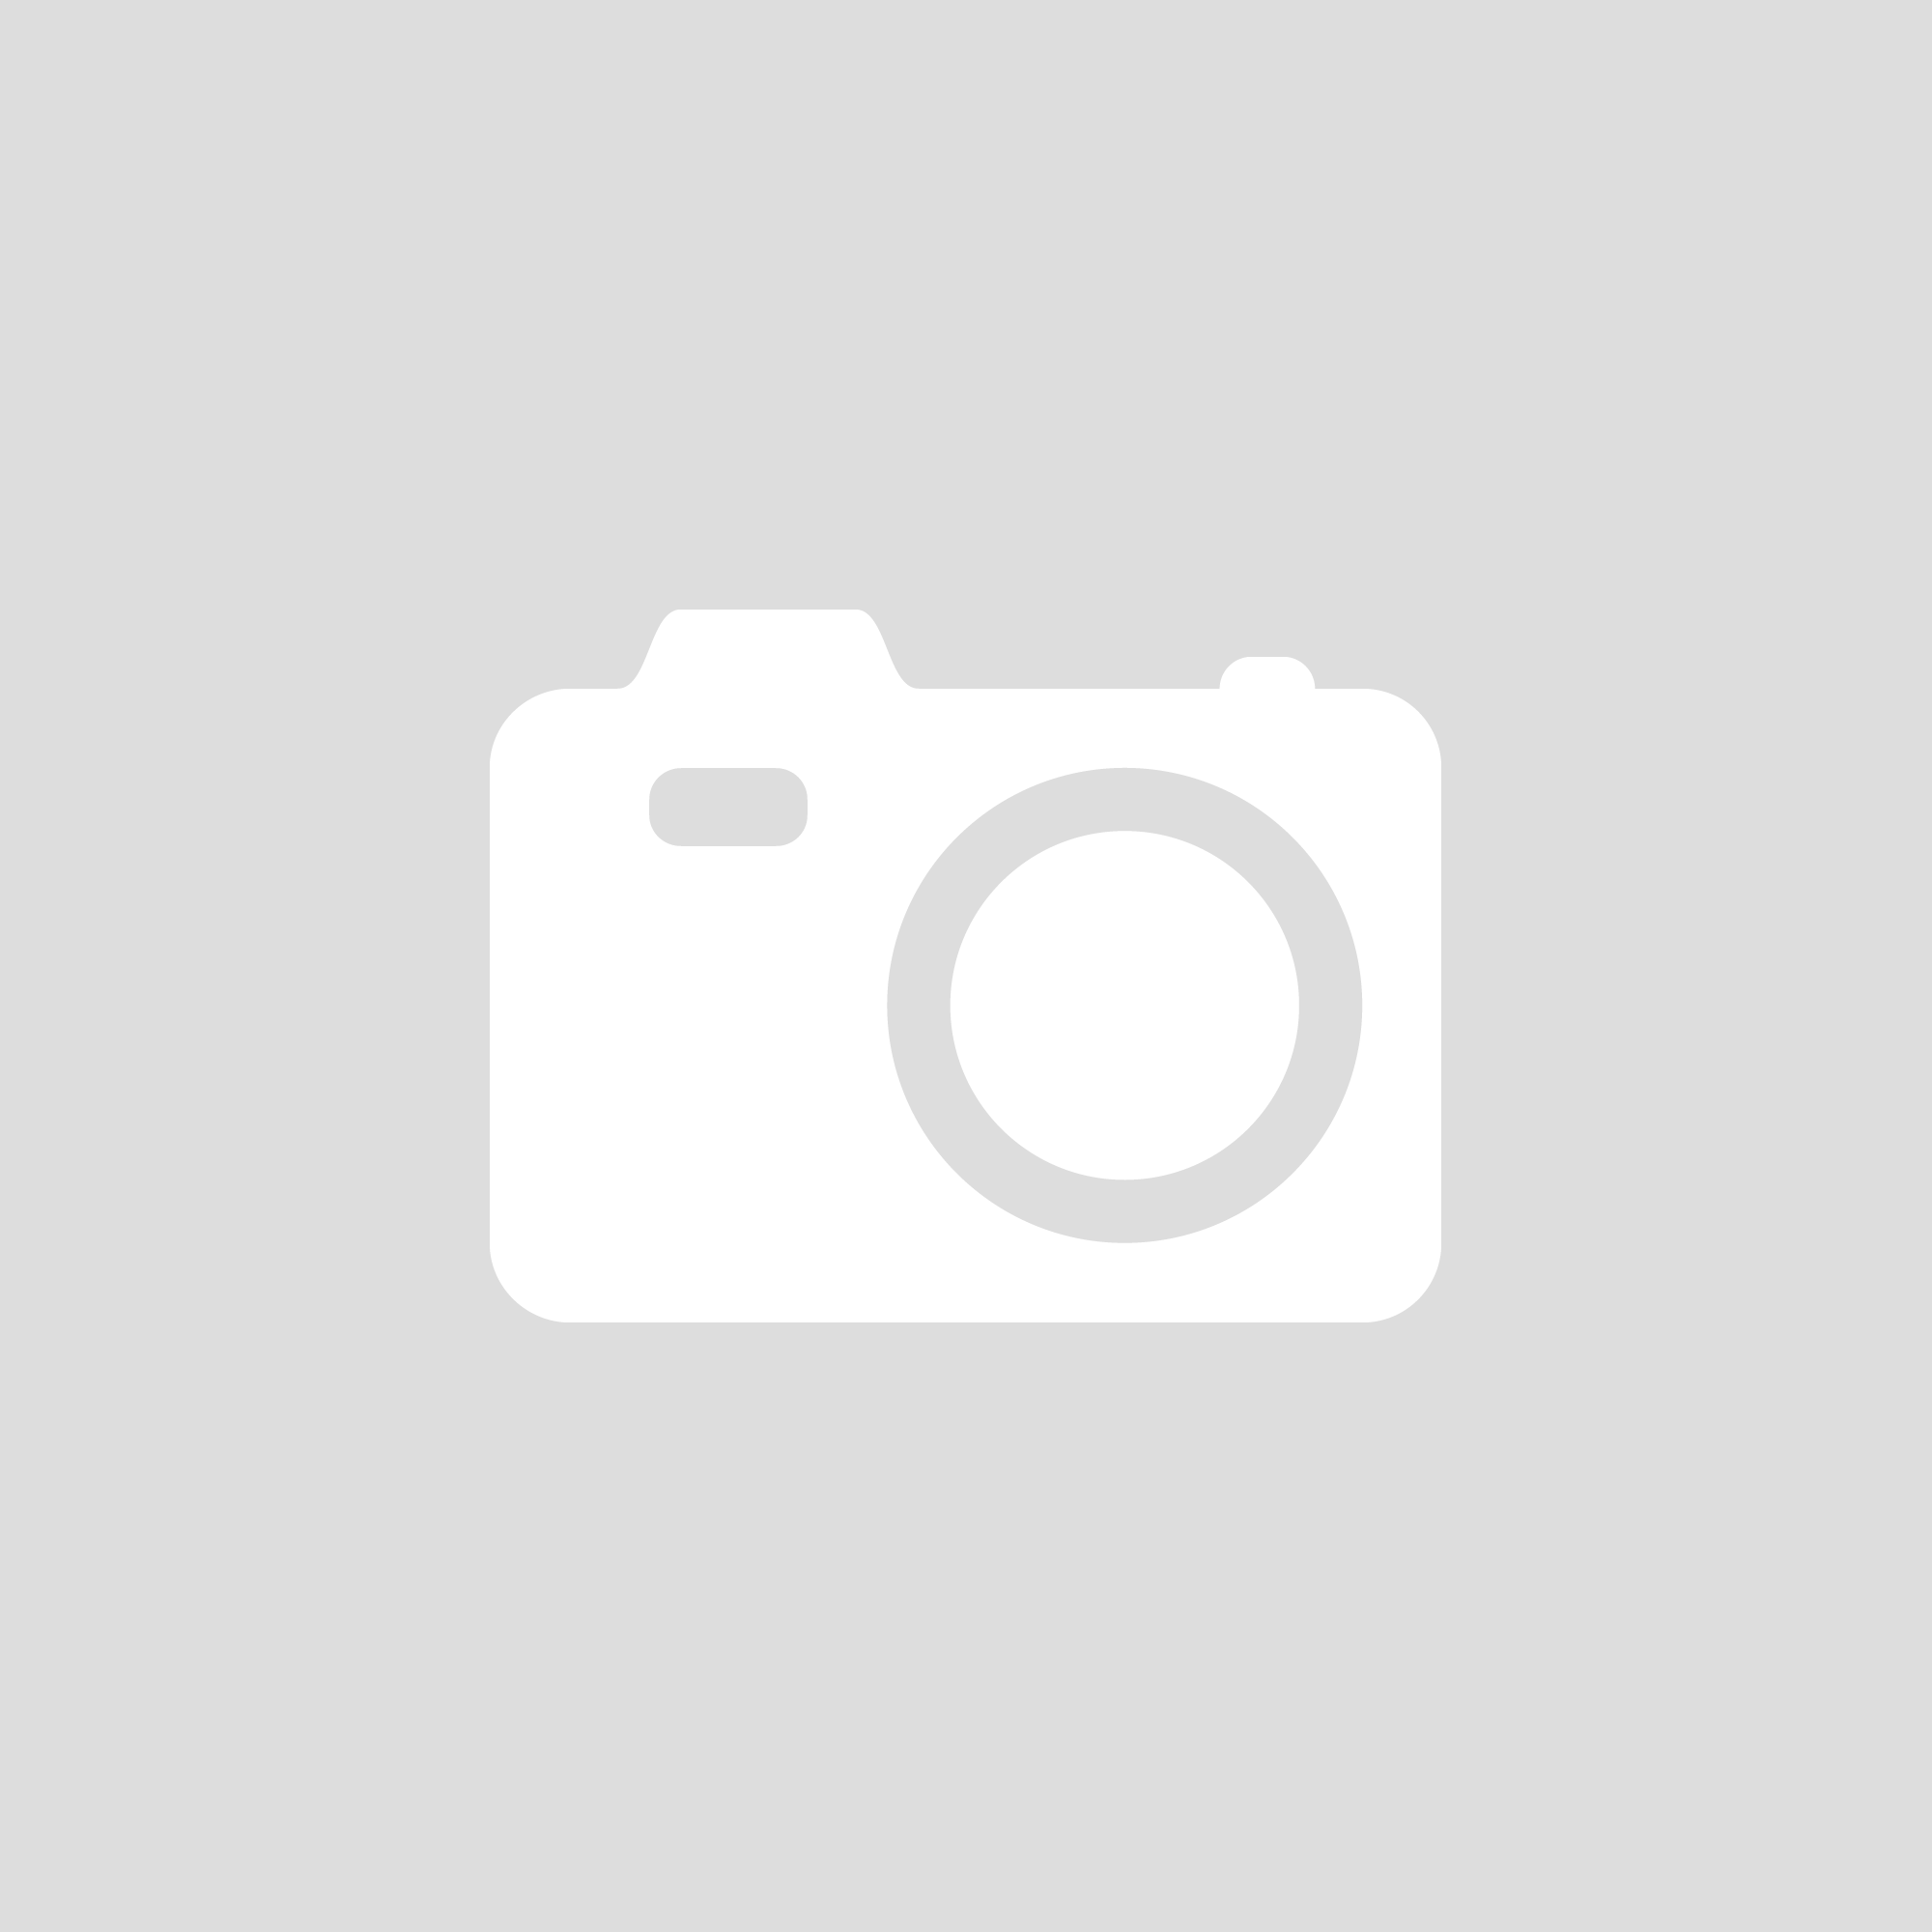 Shaggy Textured Cushion in Silver by CIMC